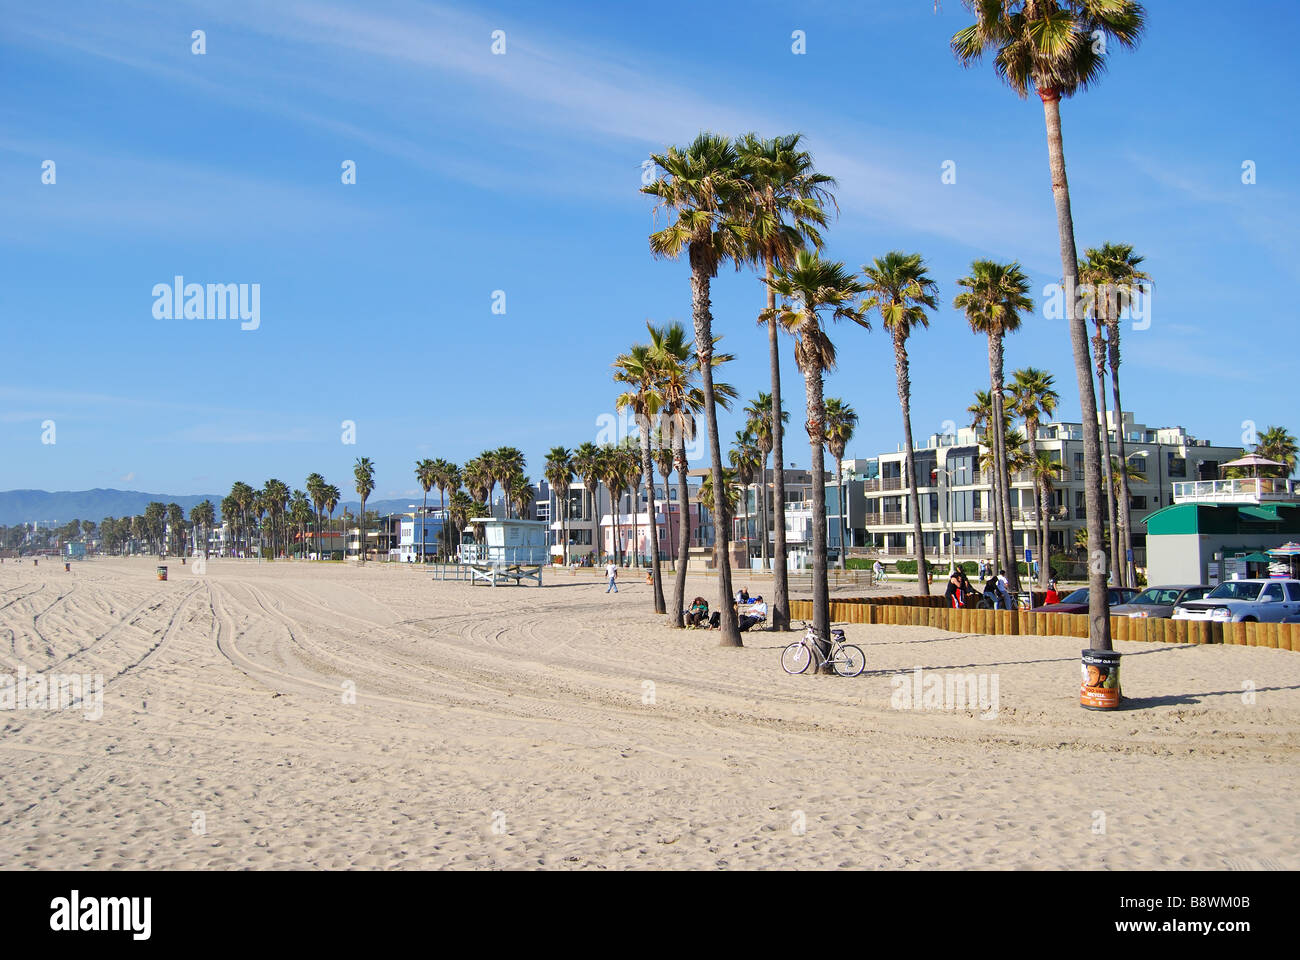 Venice Beach California Resorts